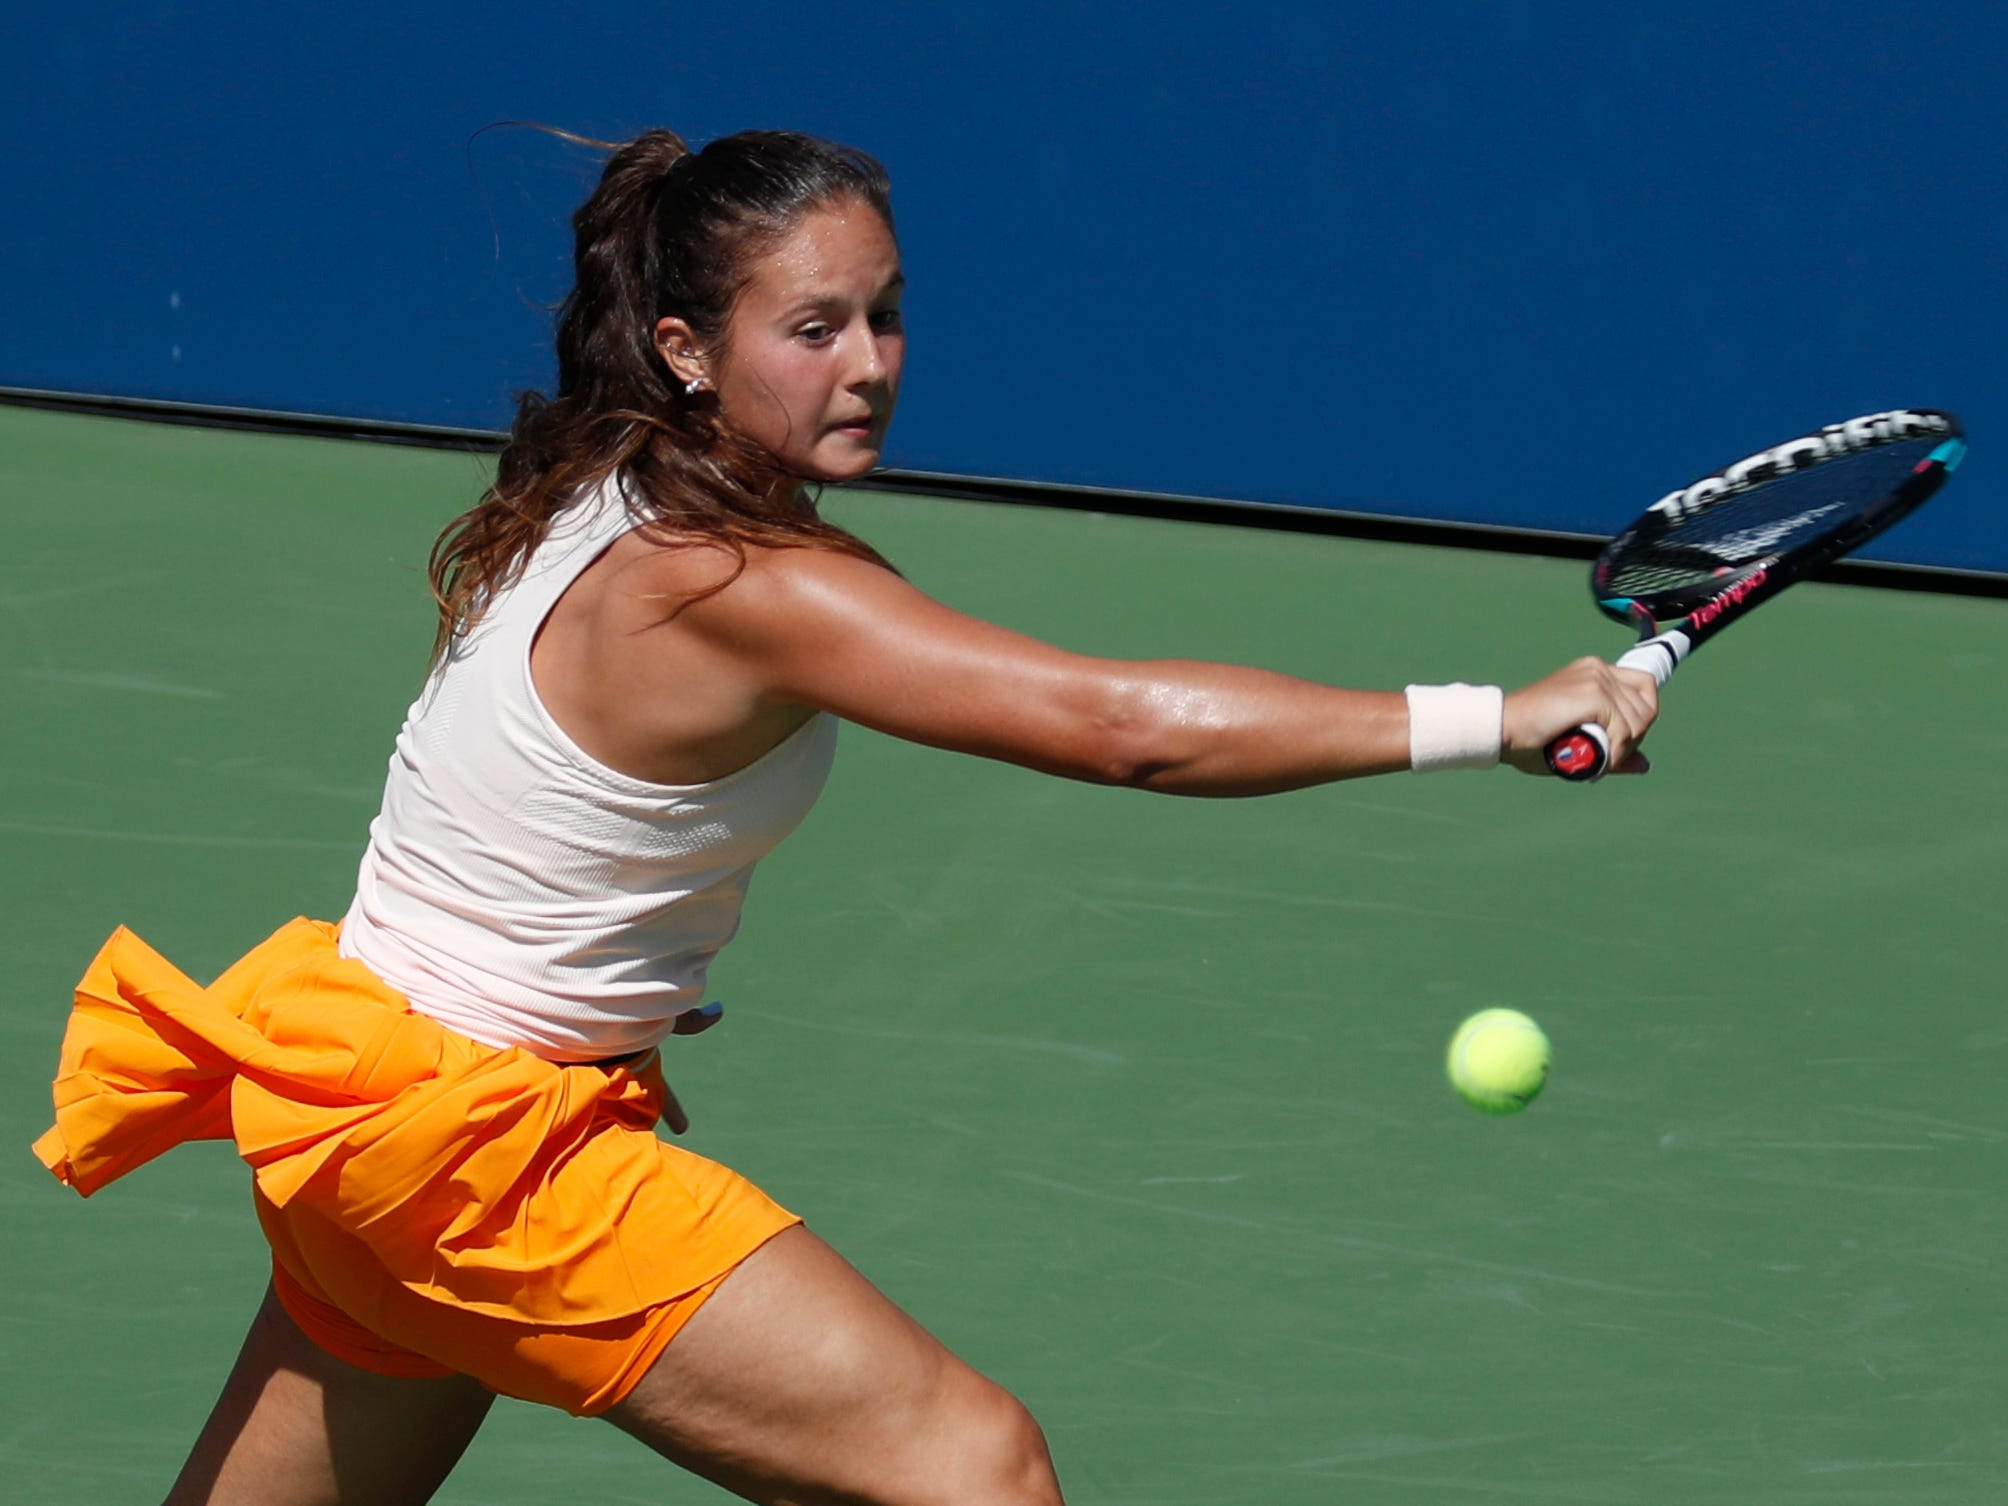 Daria Kasatkina of Russia hits to Aliaksandra Sasnovich of Belarus.